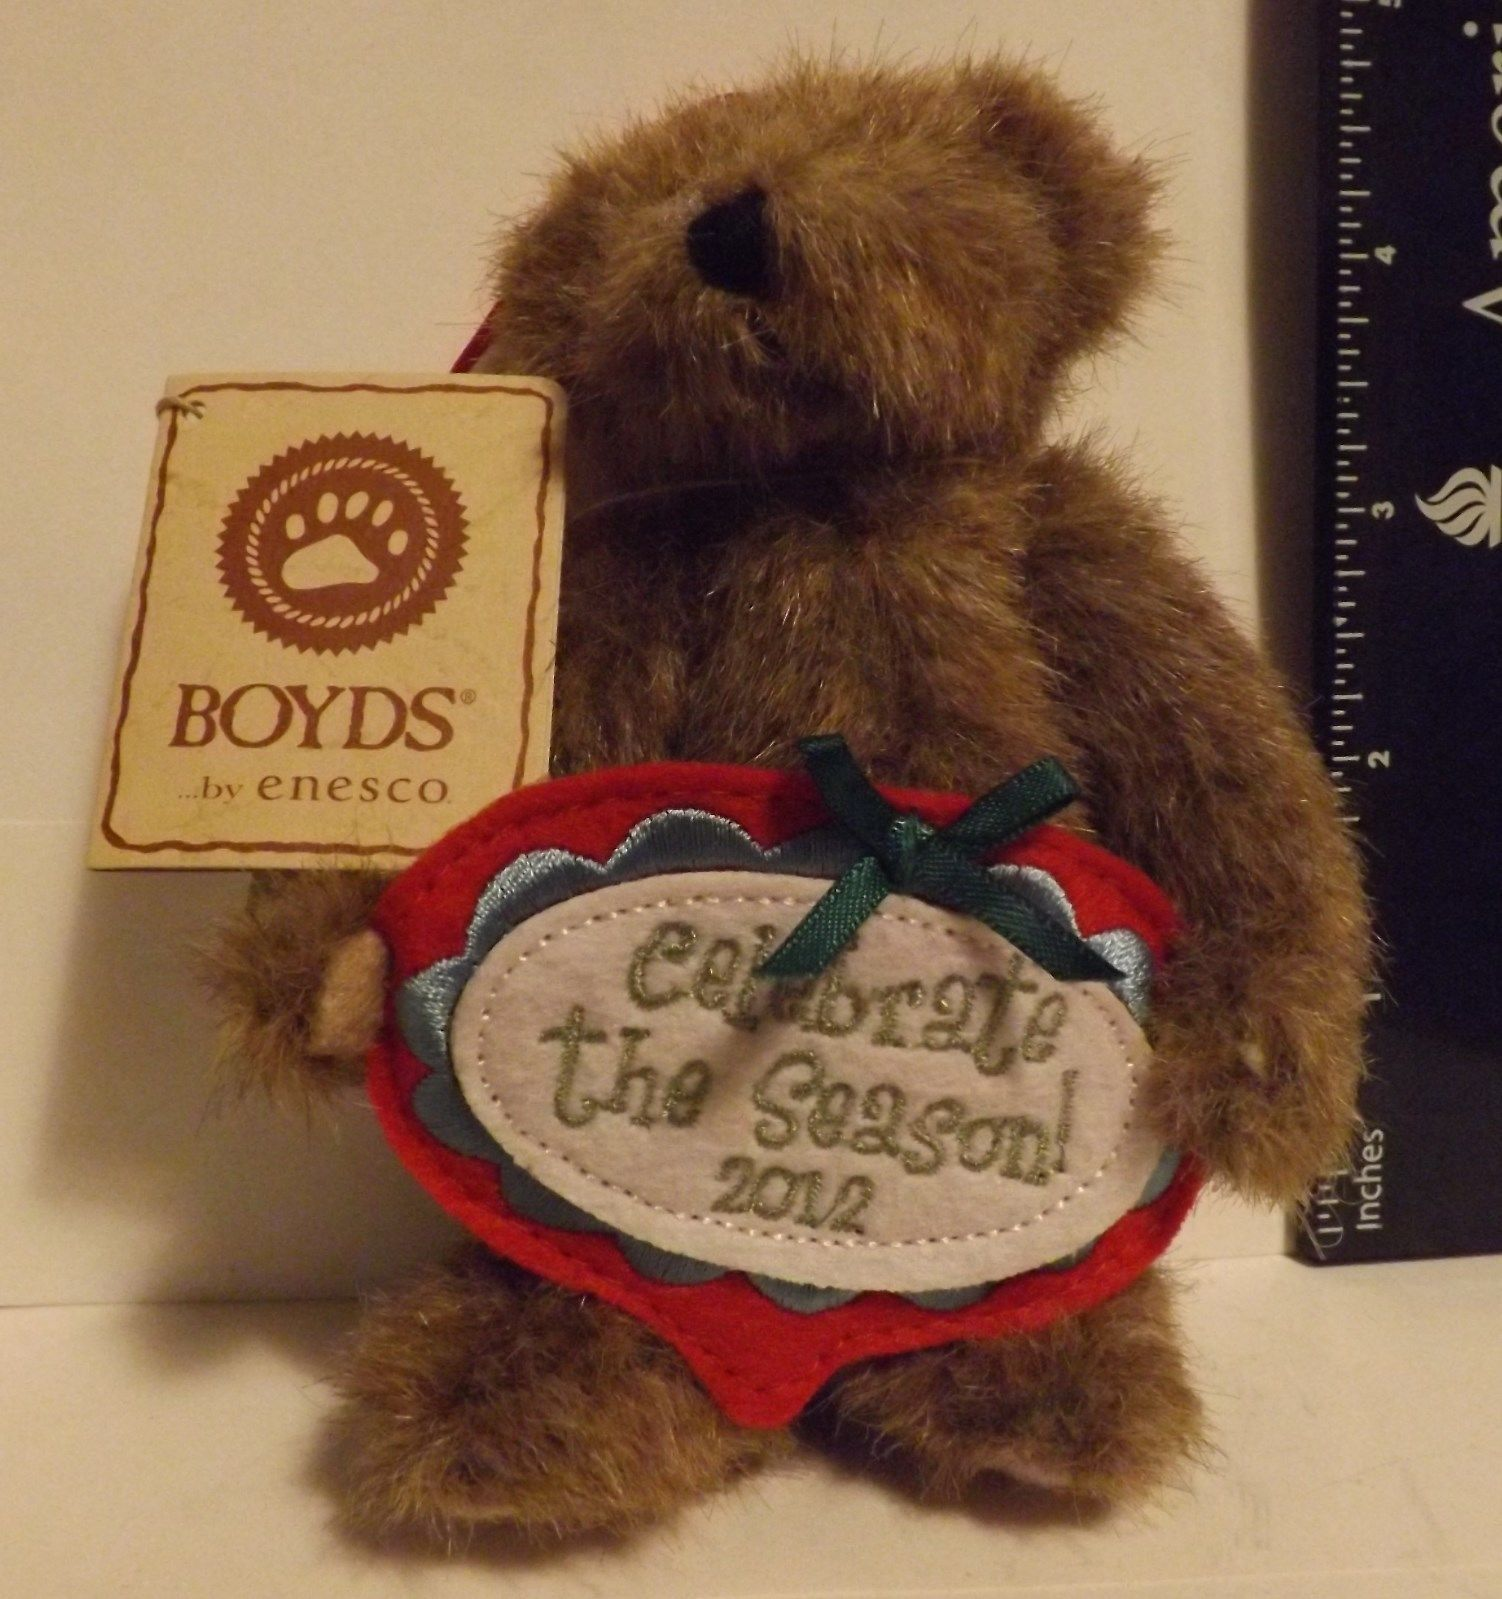 Boyds Bear Plush Ornament Merry Celebrate the Season 2012